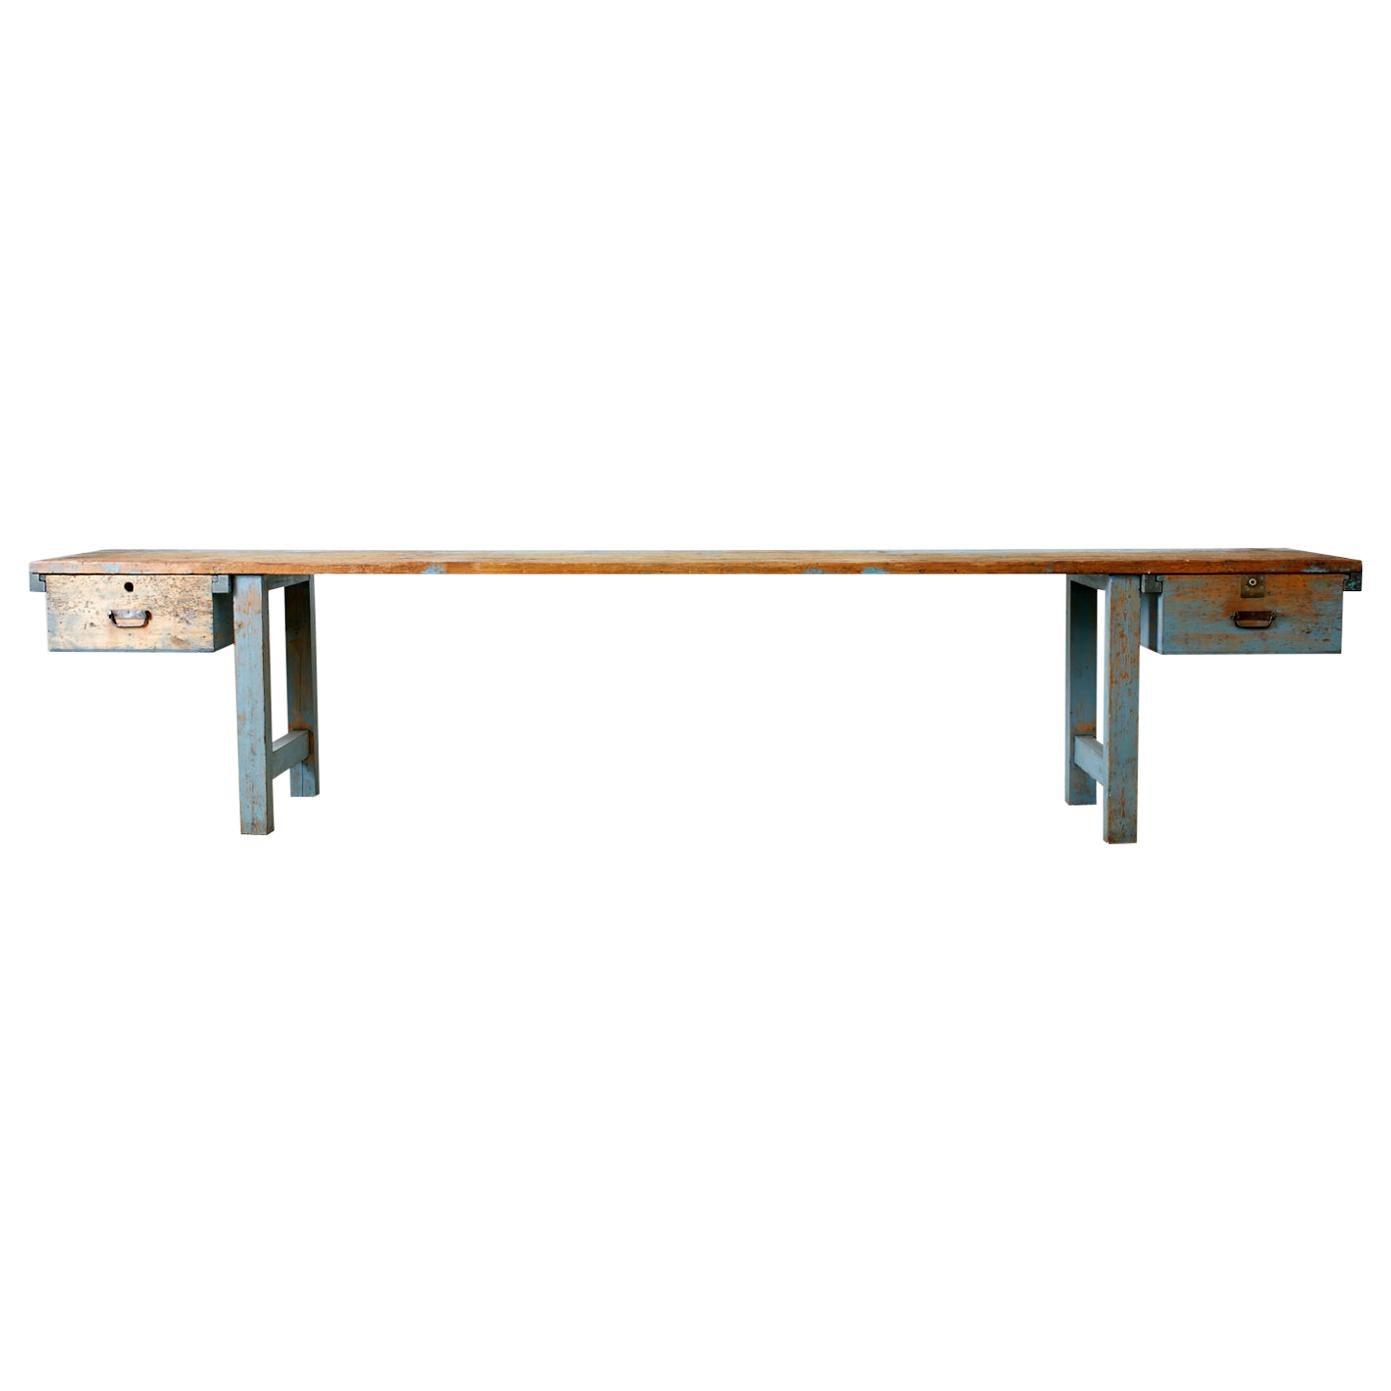 Monumental Industrial American Pine Carpenter's Workbench